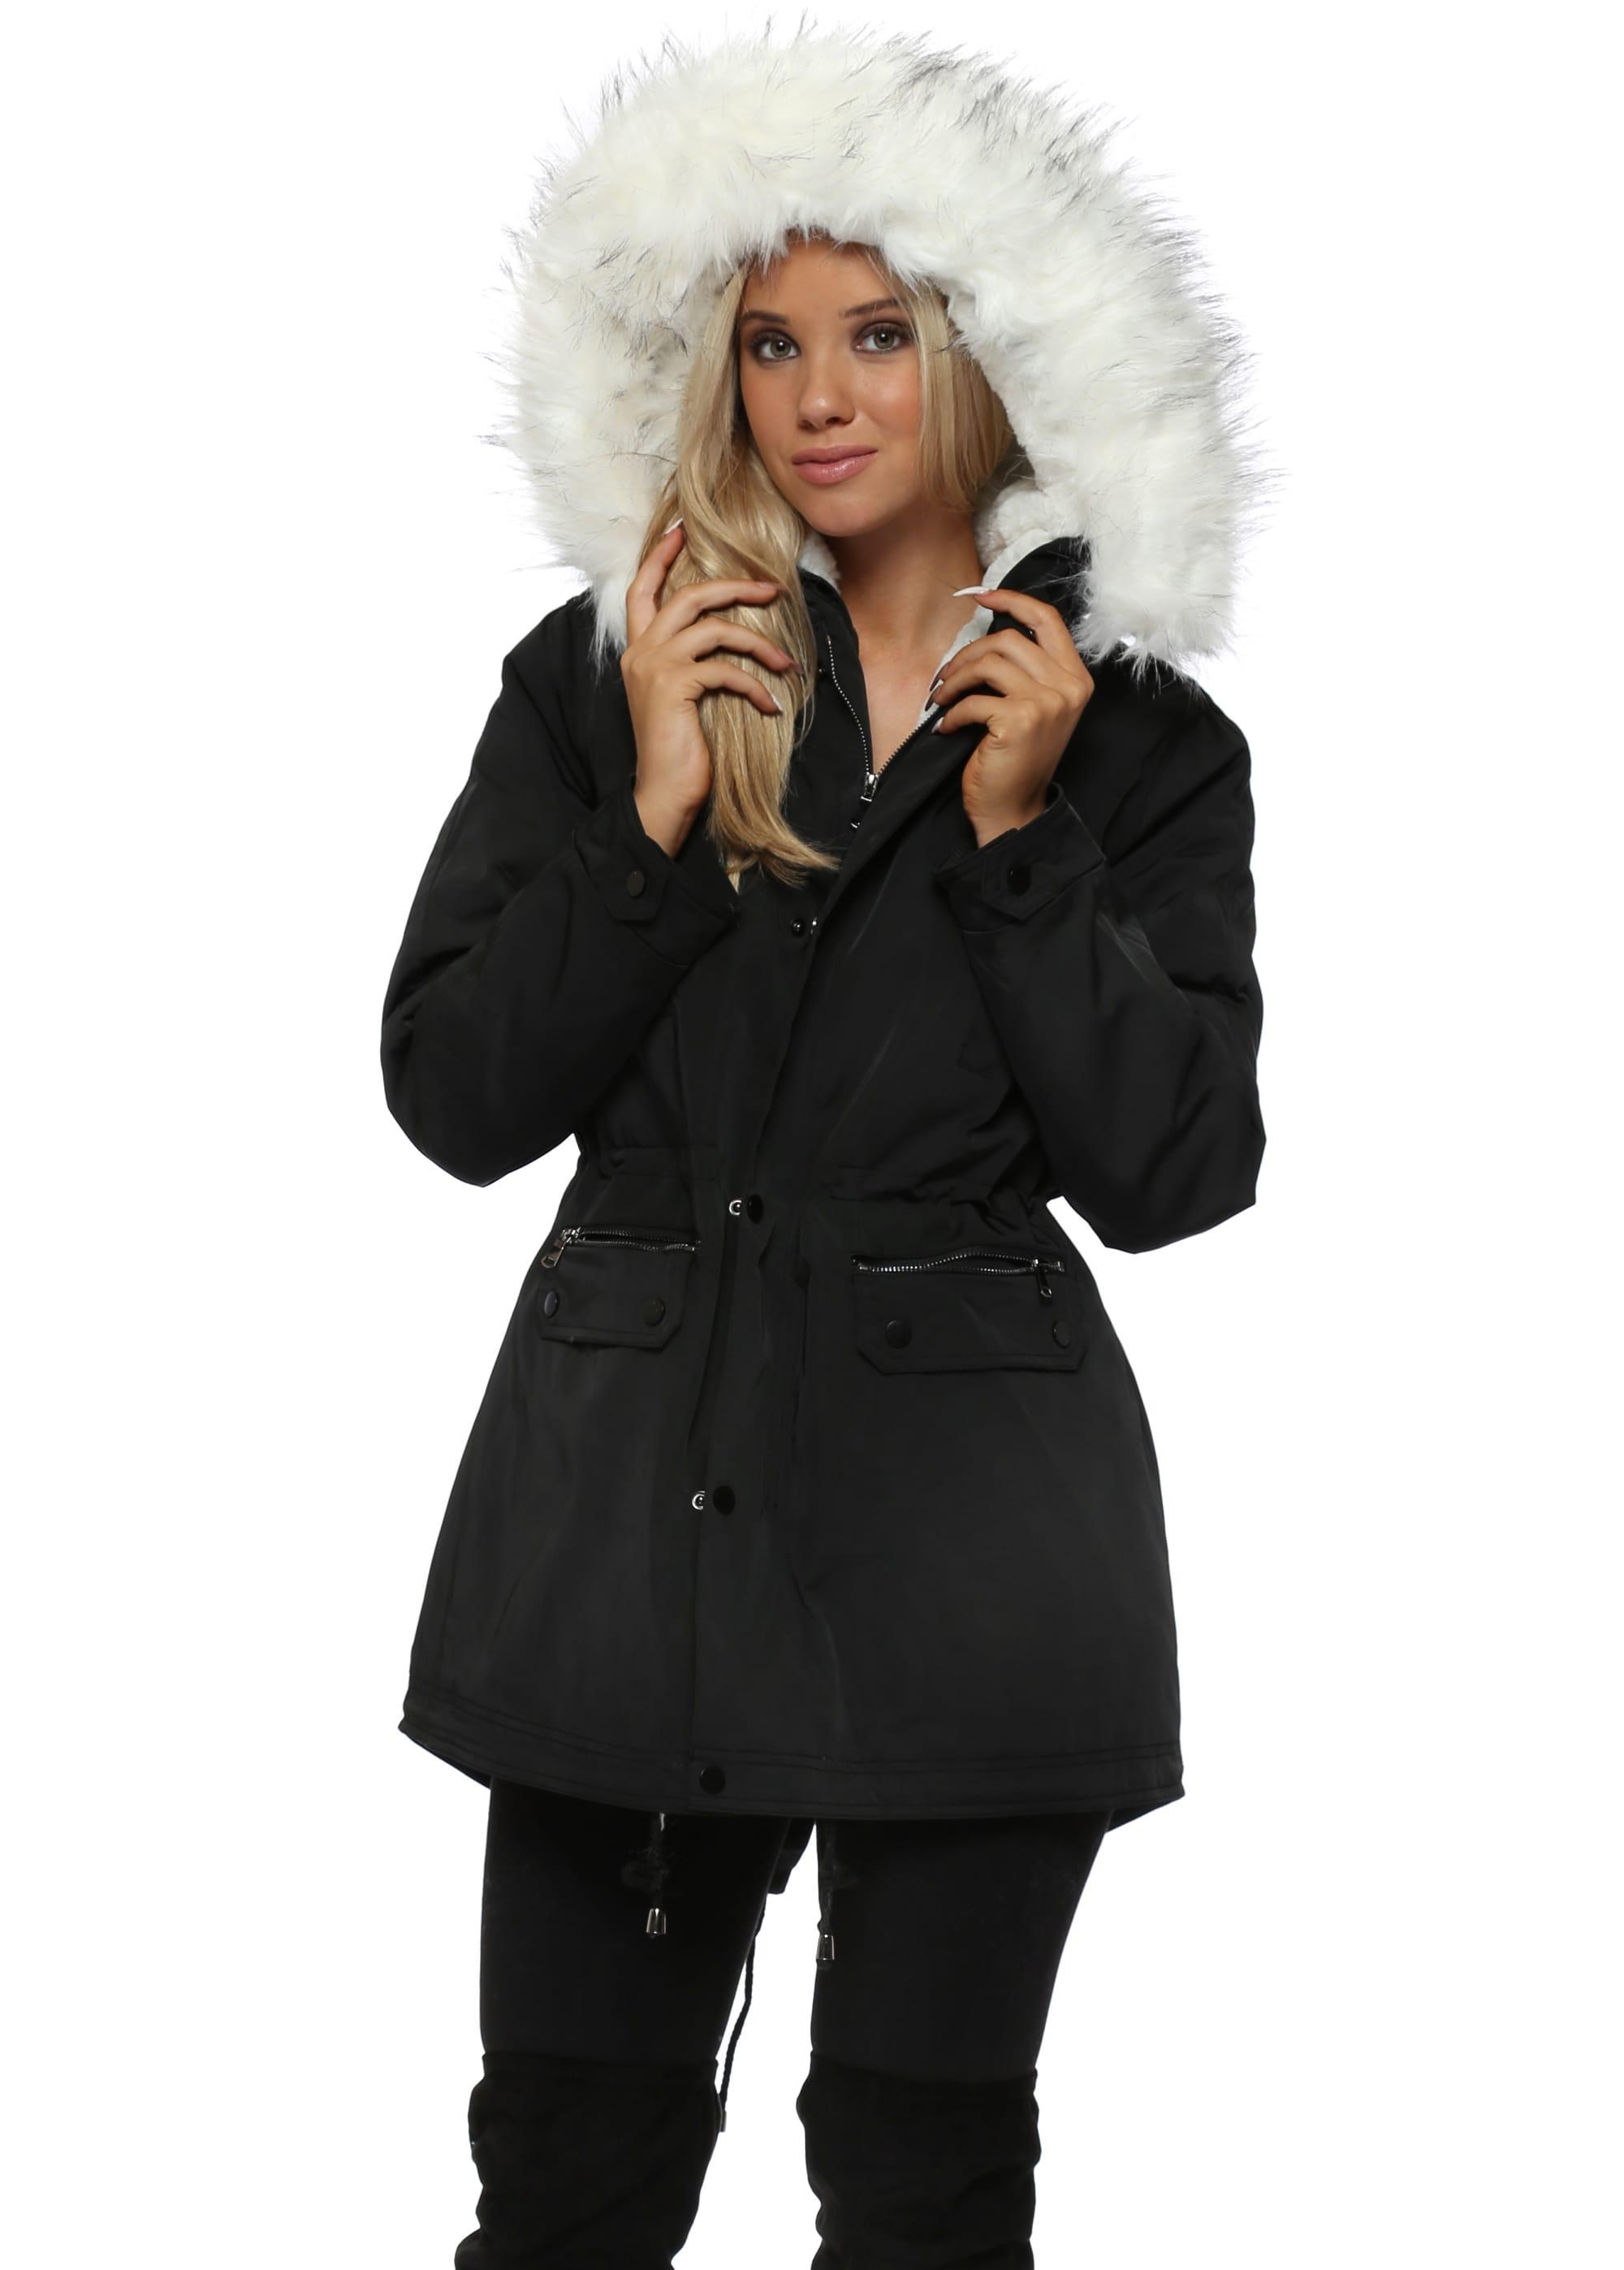 5e1b4428a2d8f Black Faux Fur Hooded Parka Coat - Drole De Copine